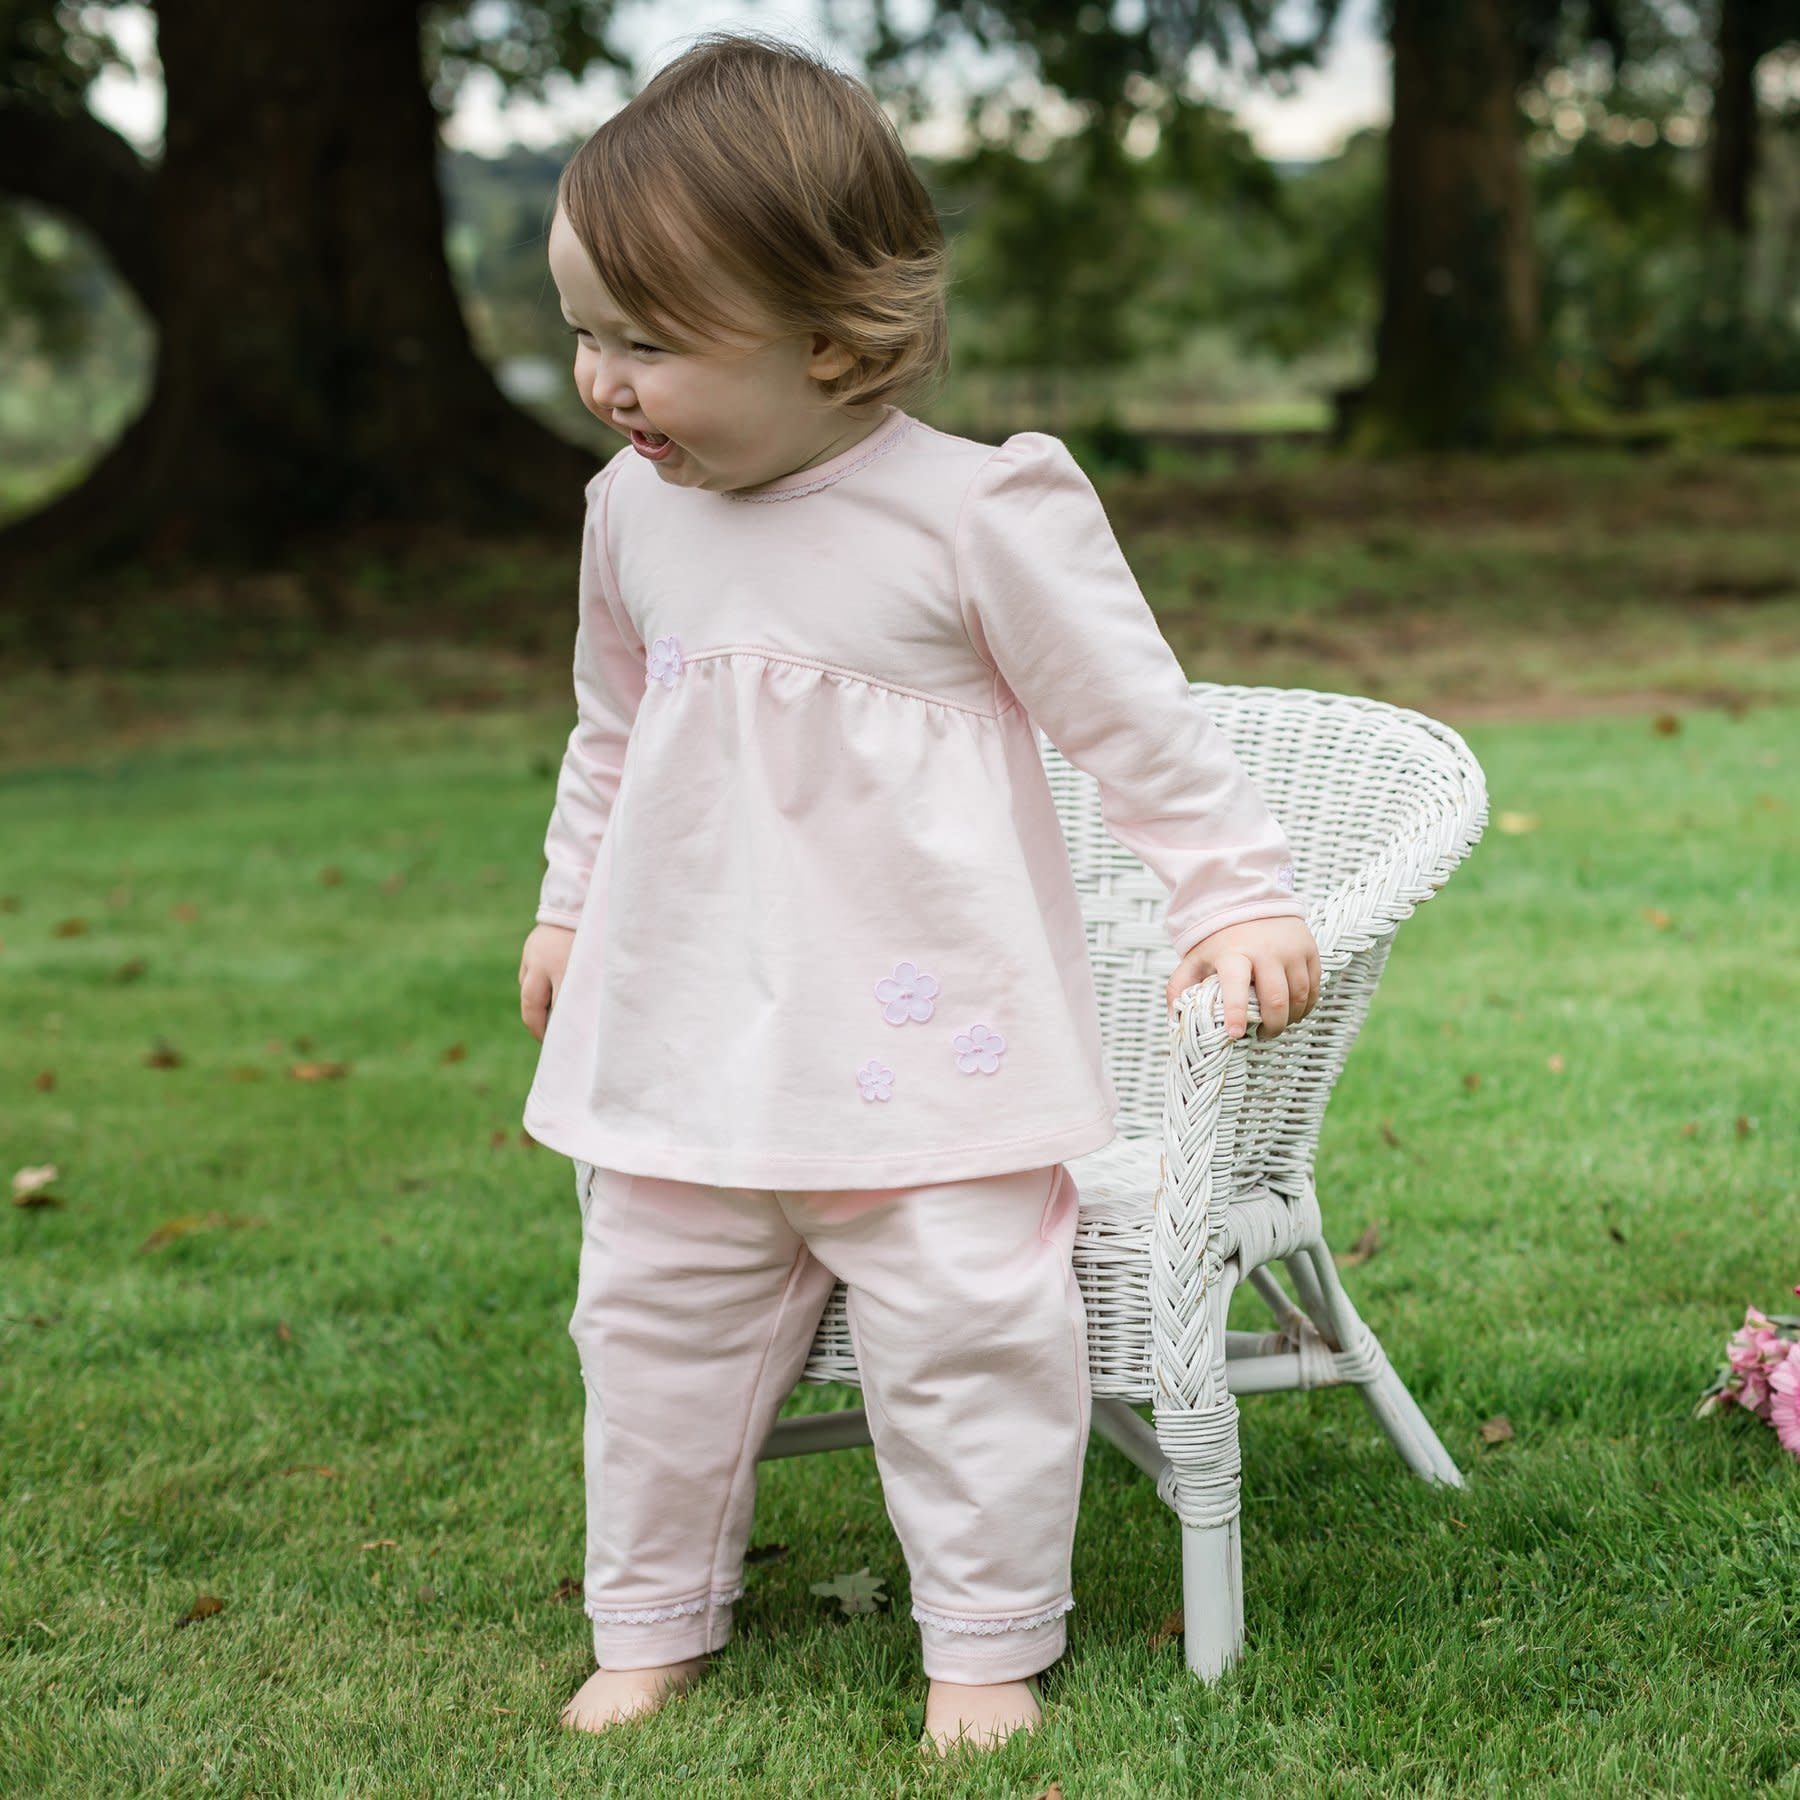 Emile et Rose Emile Et Rose Winsley Baby Top & Trouser Set S21